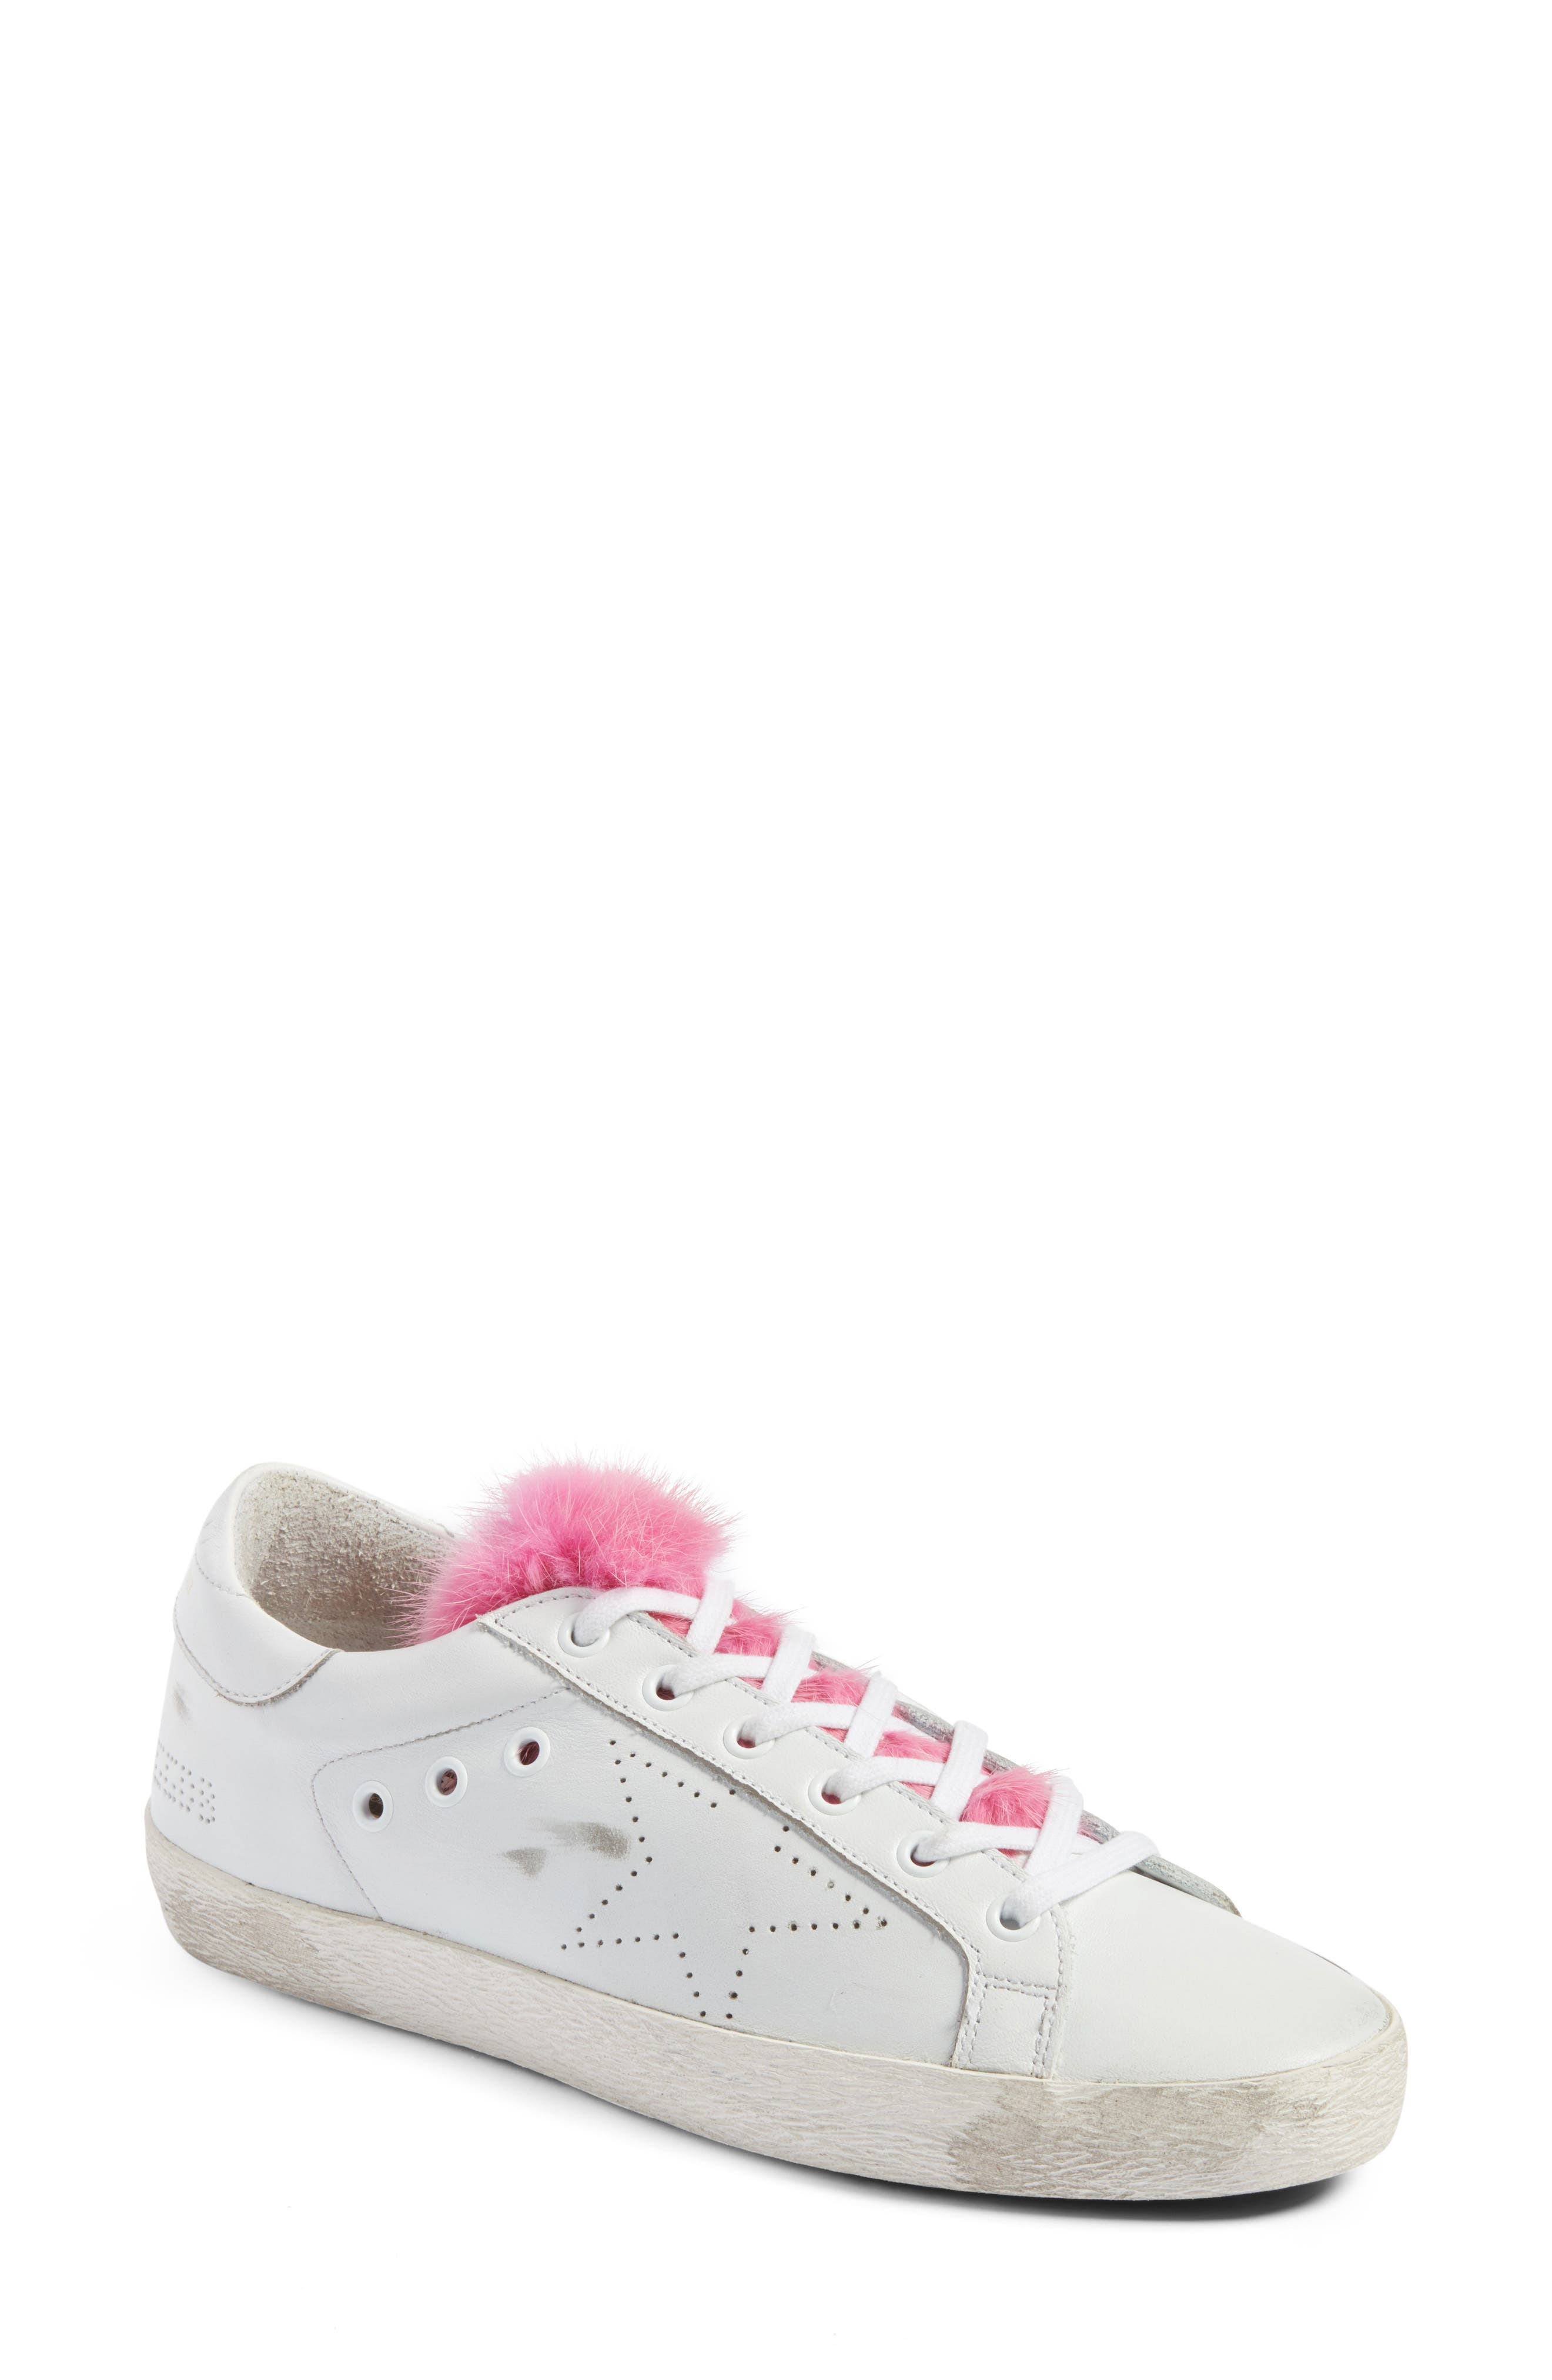 Superstar Genuine Mink Fur Sneaker,                         Main,                         color, White Leather/ Pink